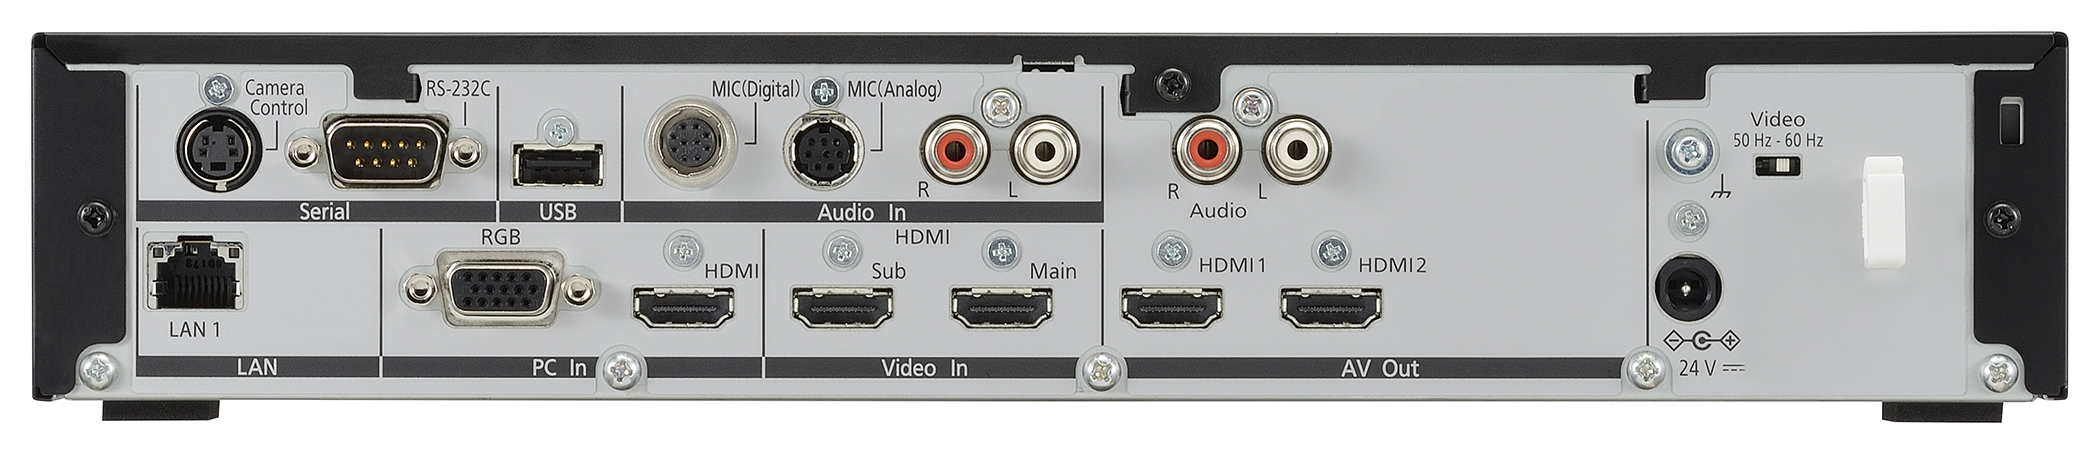 KX VC1300 03 Кодек KX VC1300